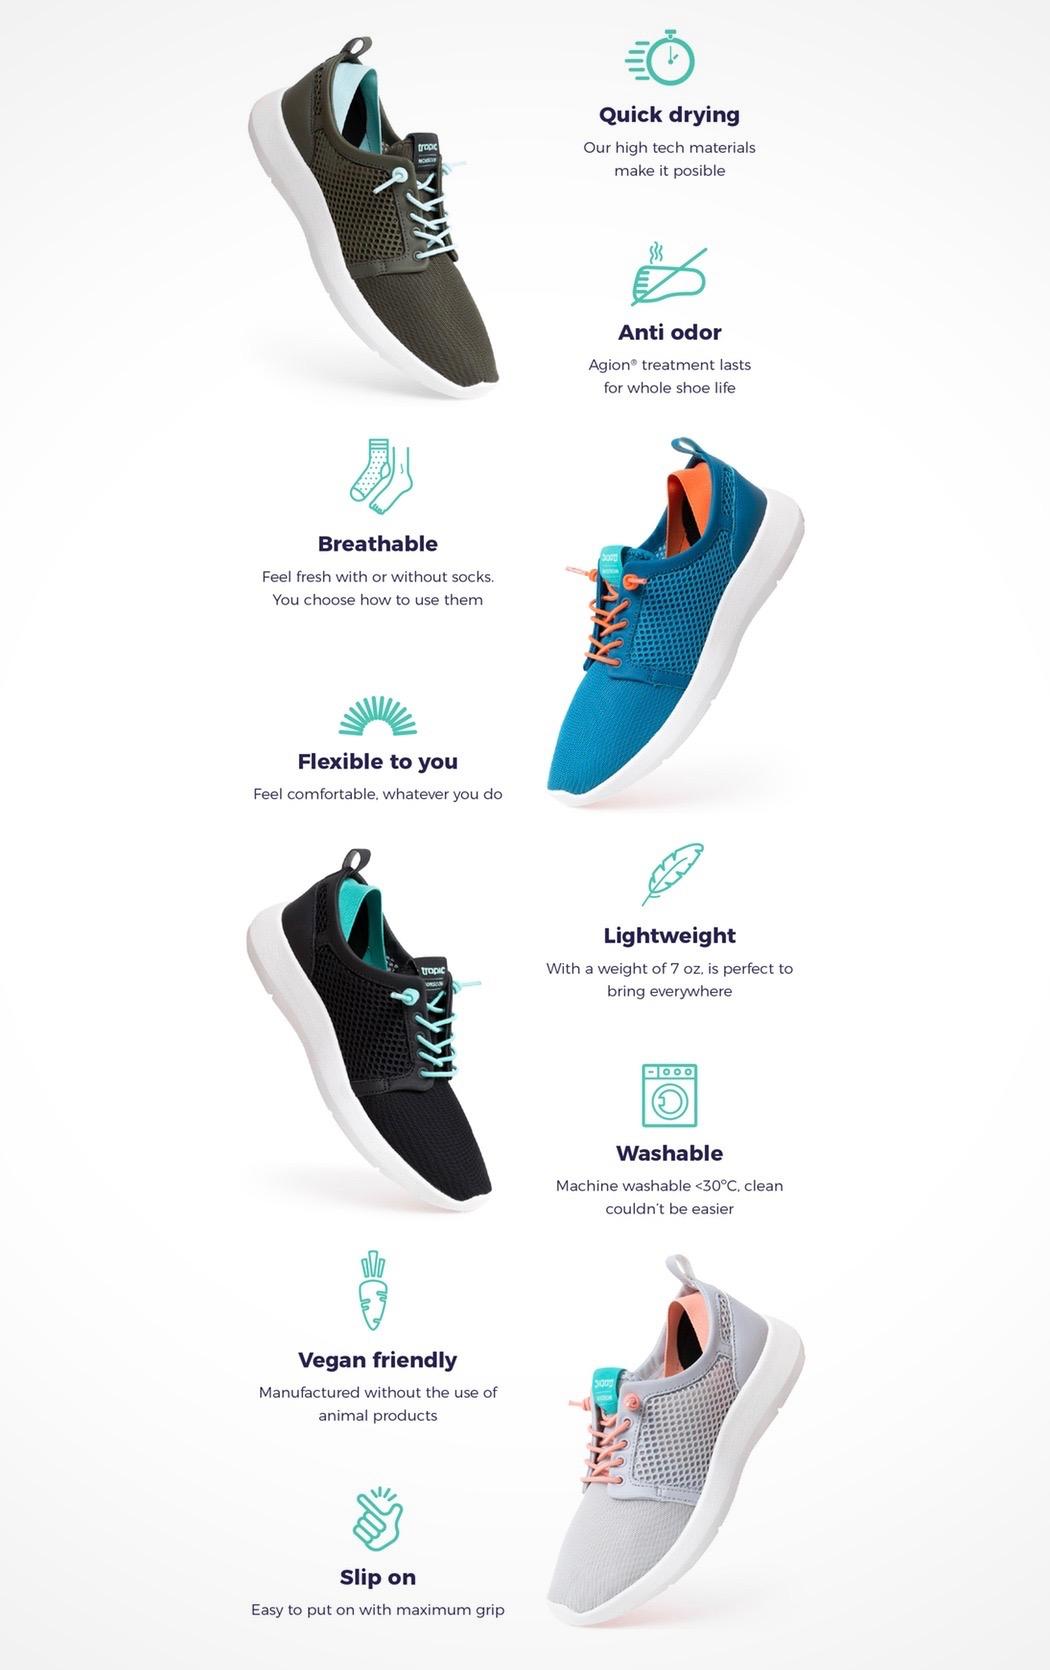 tropic_ultimate_shoe_03